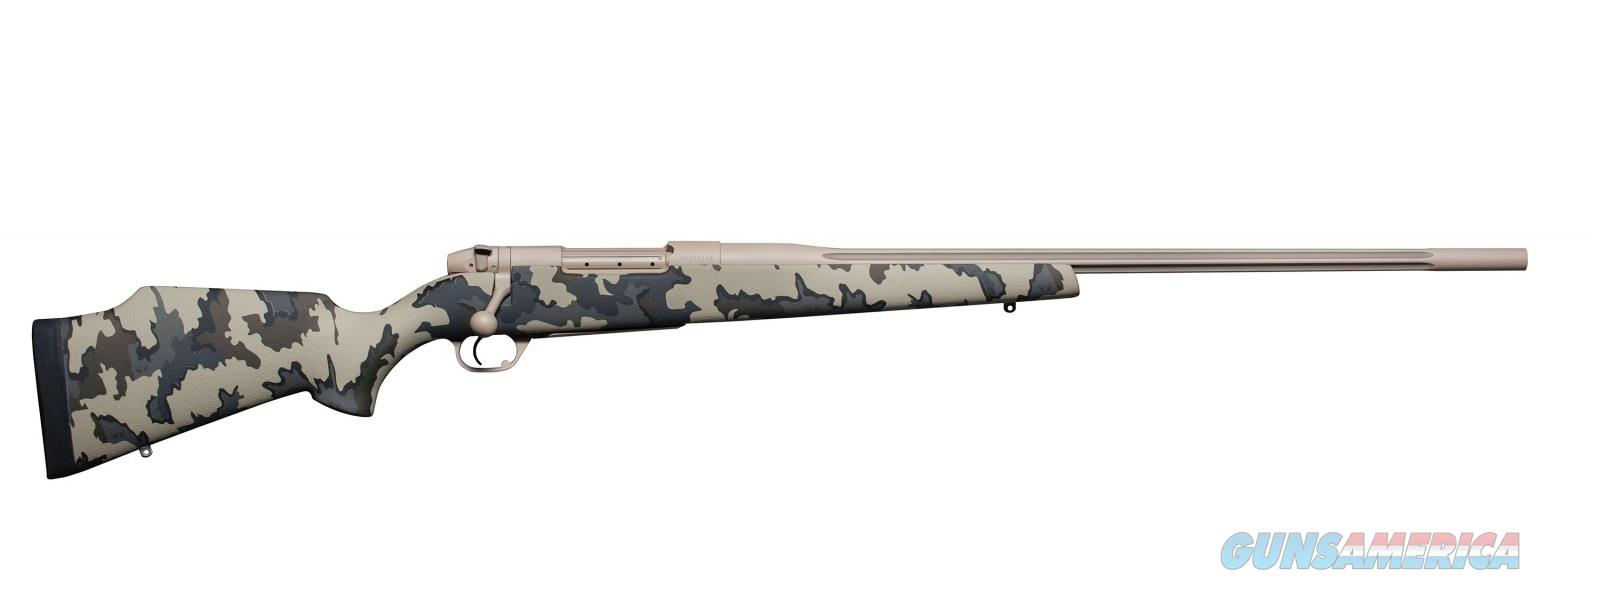 Weatherby Mark V Arroyo RC 7mm Wby Mag MAYM7MMWR6O   Guns > Rifles > Weatherby Rifles > Sporting